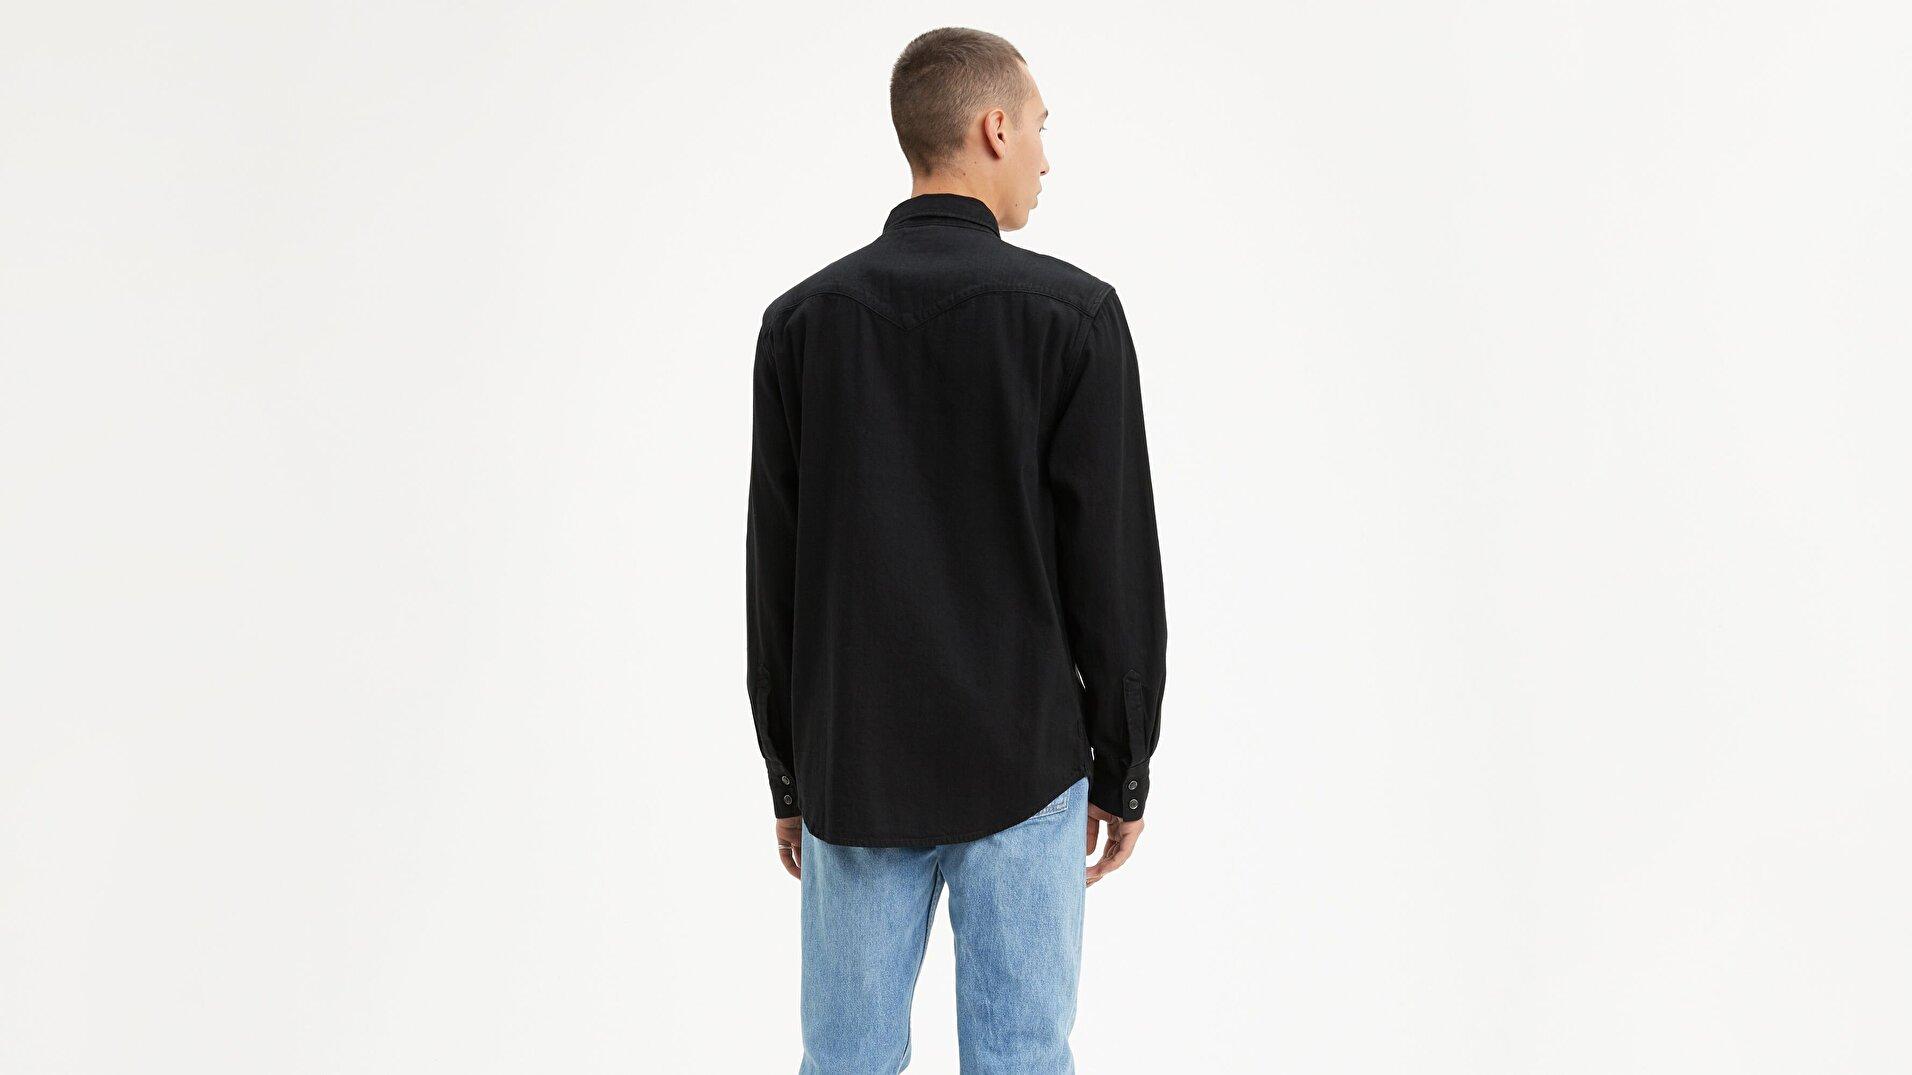 Barstow Western Standard Marble Siyah Erkek Gömlek